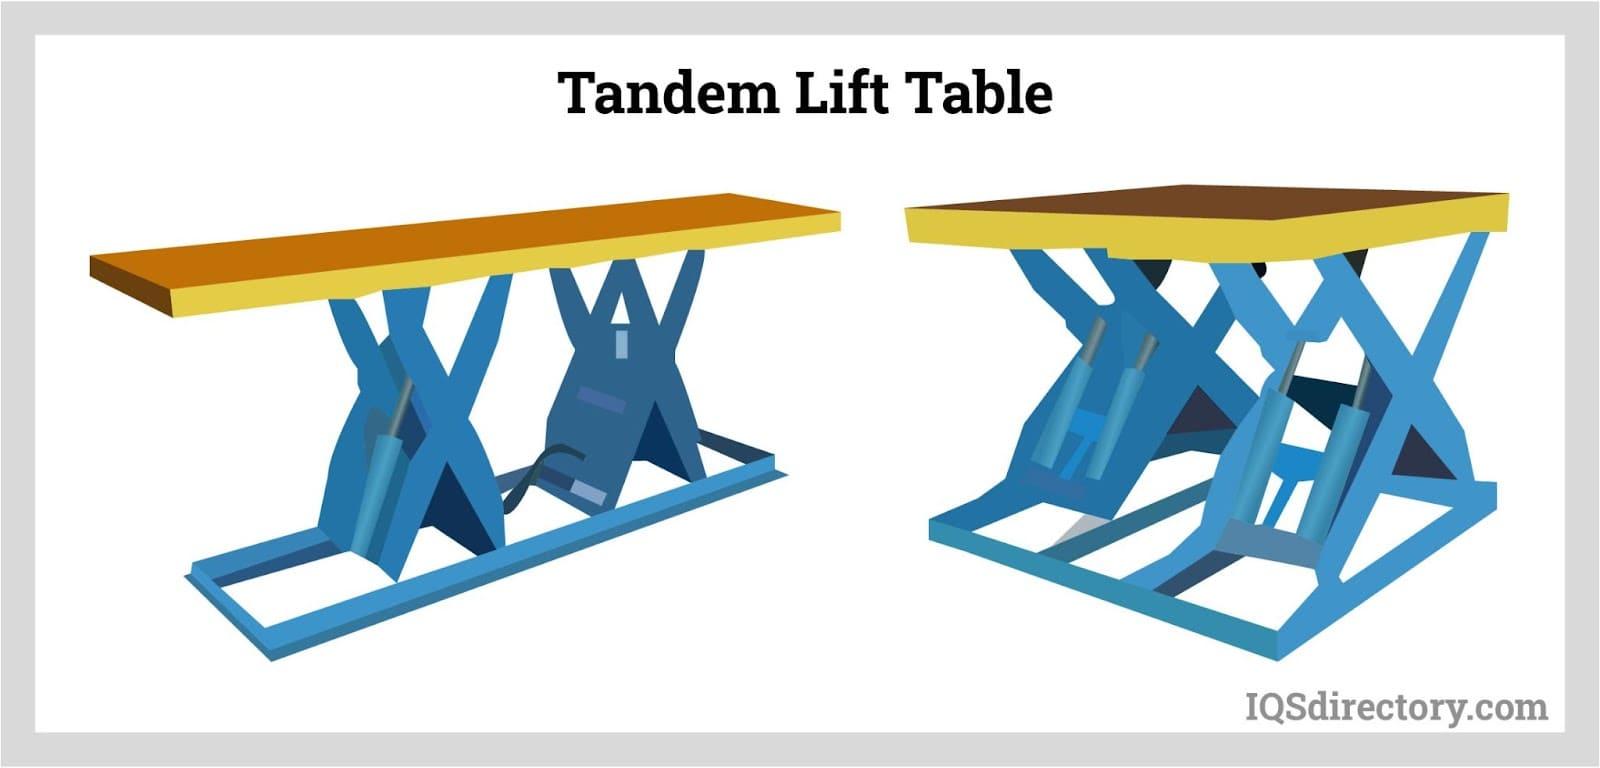 Tandem Lift Table